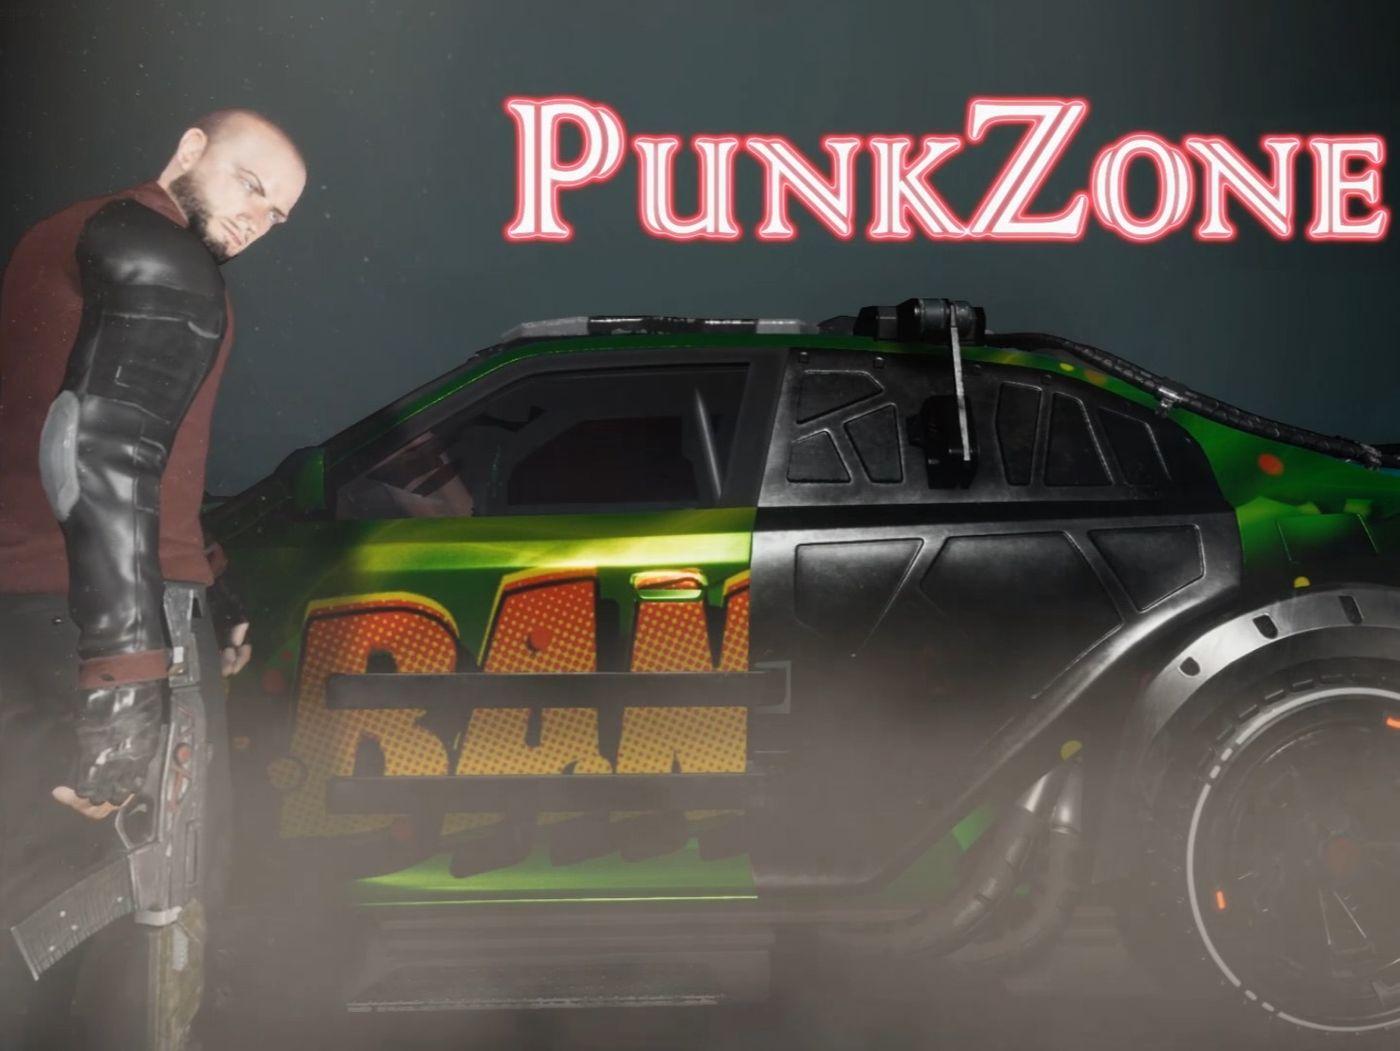 PunkZone!